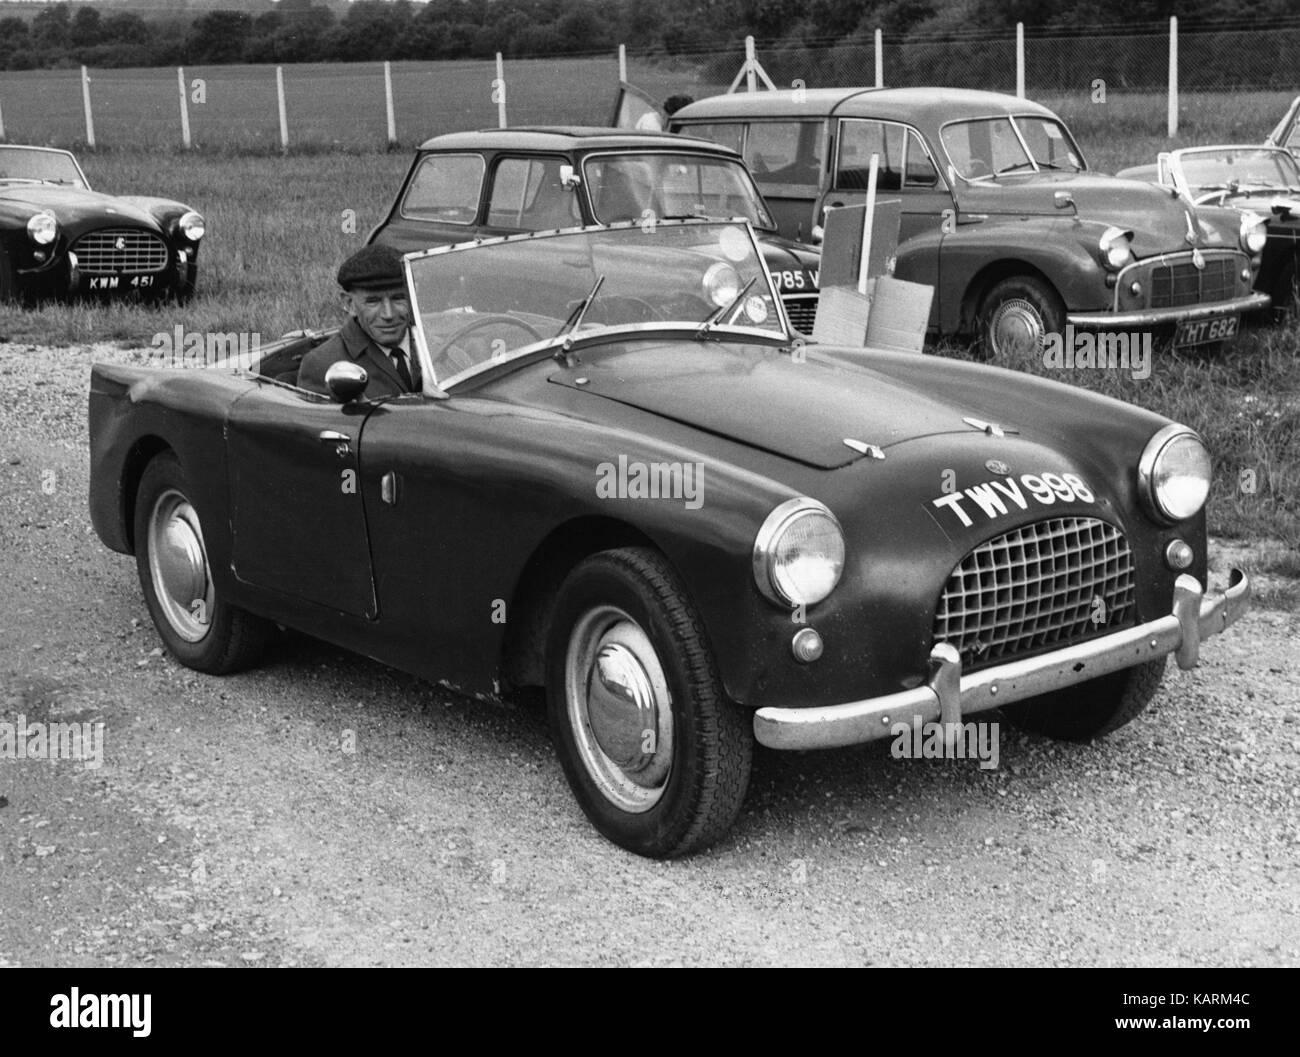 1959 Turner Sports a35 Imagen De Stock